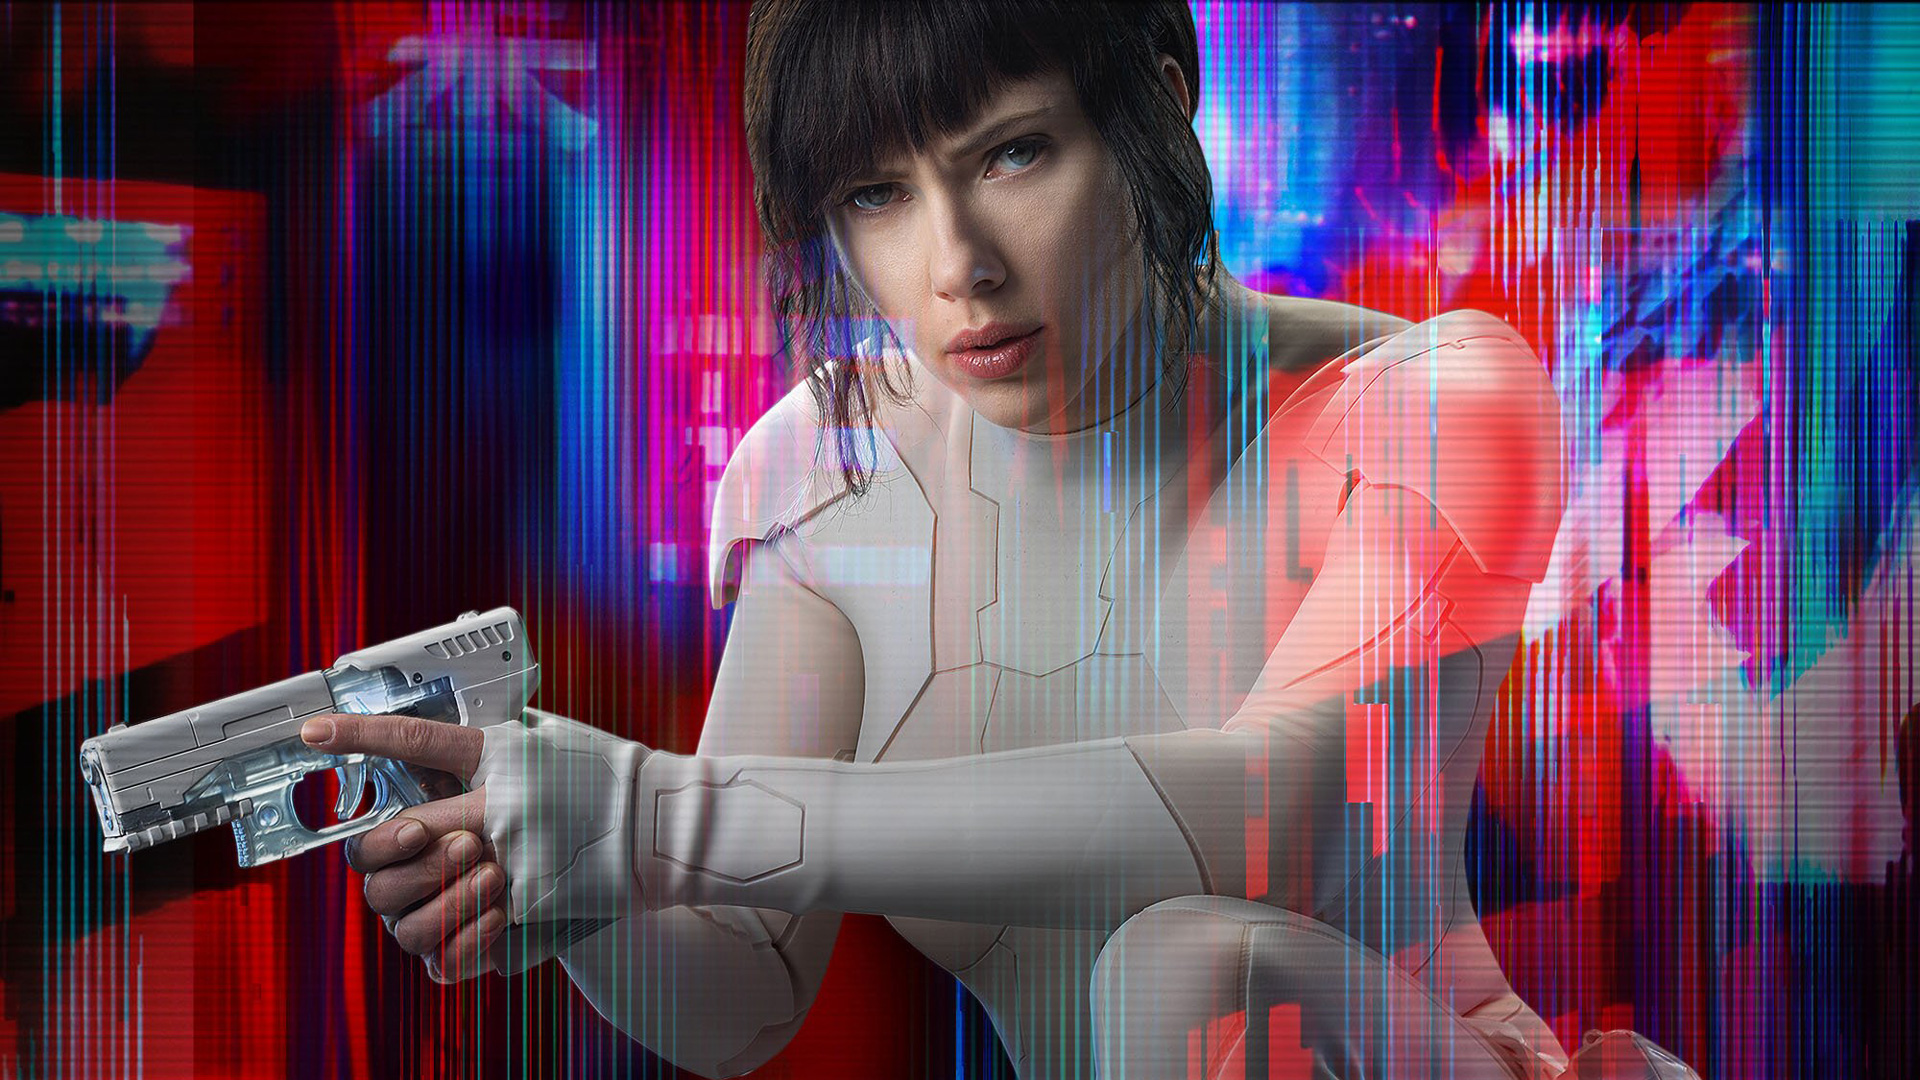 Scarlett Johansson Ghost In The Shell, HD Movies, 4k